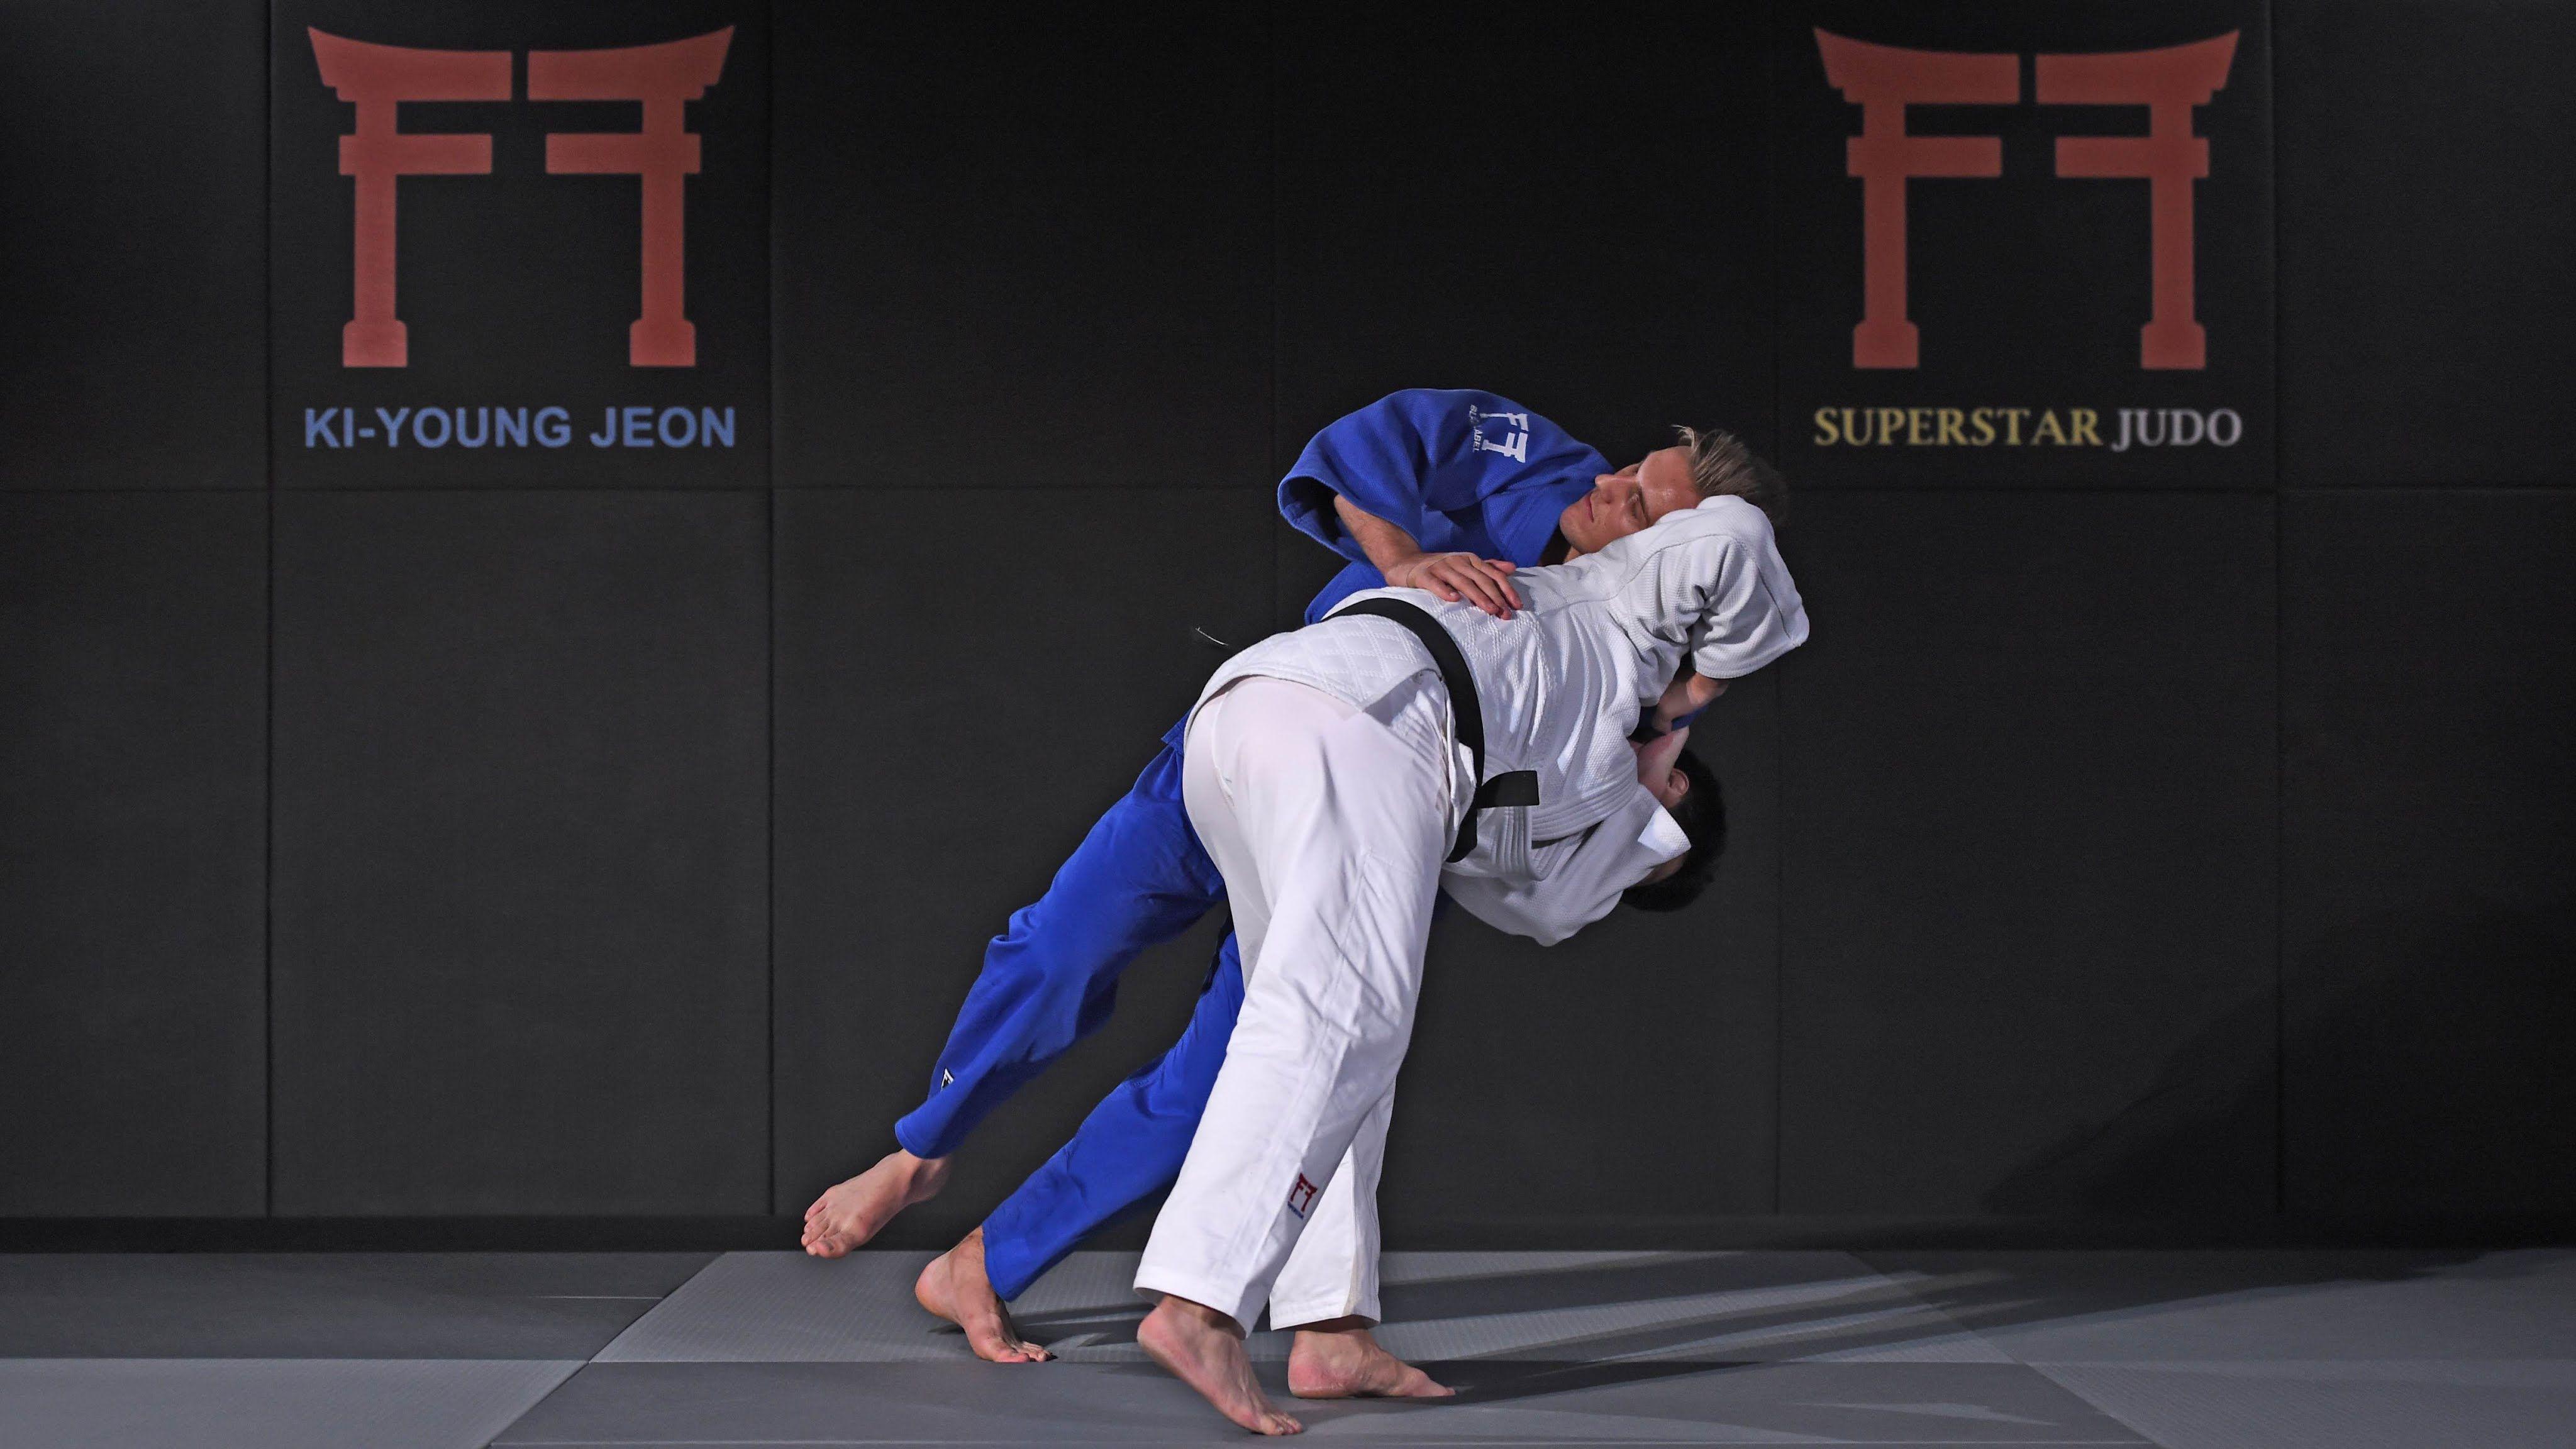 Superstar Judo Korean Reverse Seoi Nage Judo Superstar Martial Arts